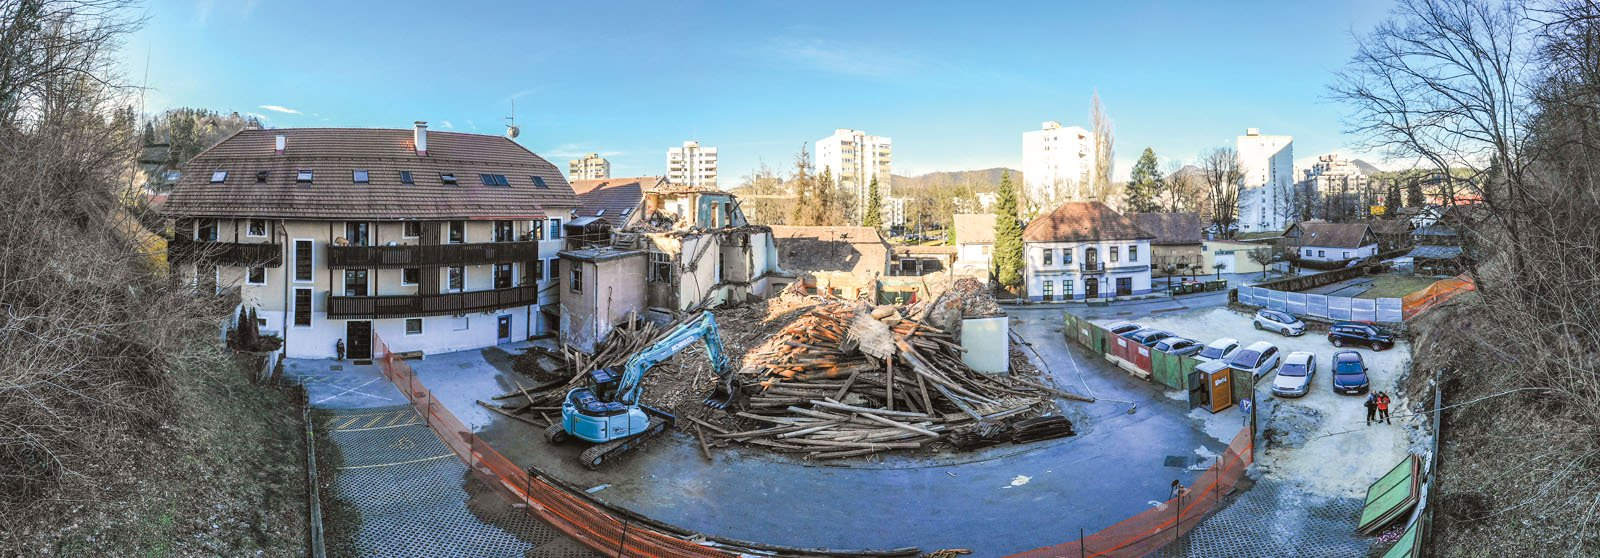 Foto reportaža rušitve objekta Stari trg 11